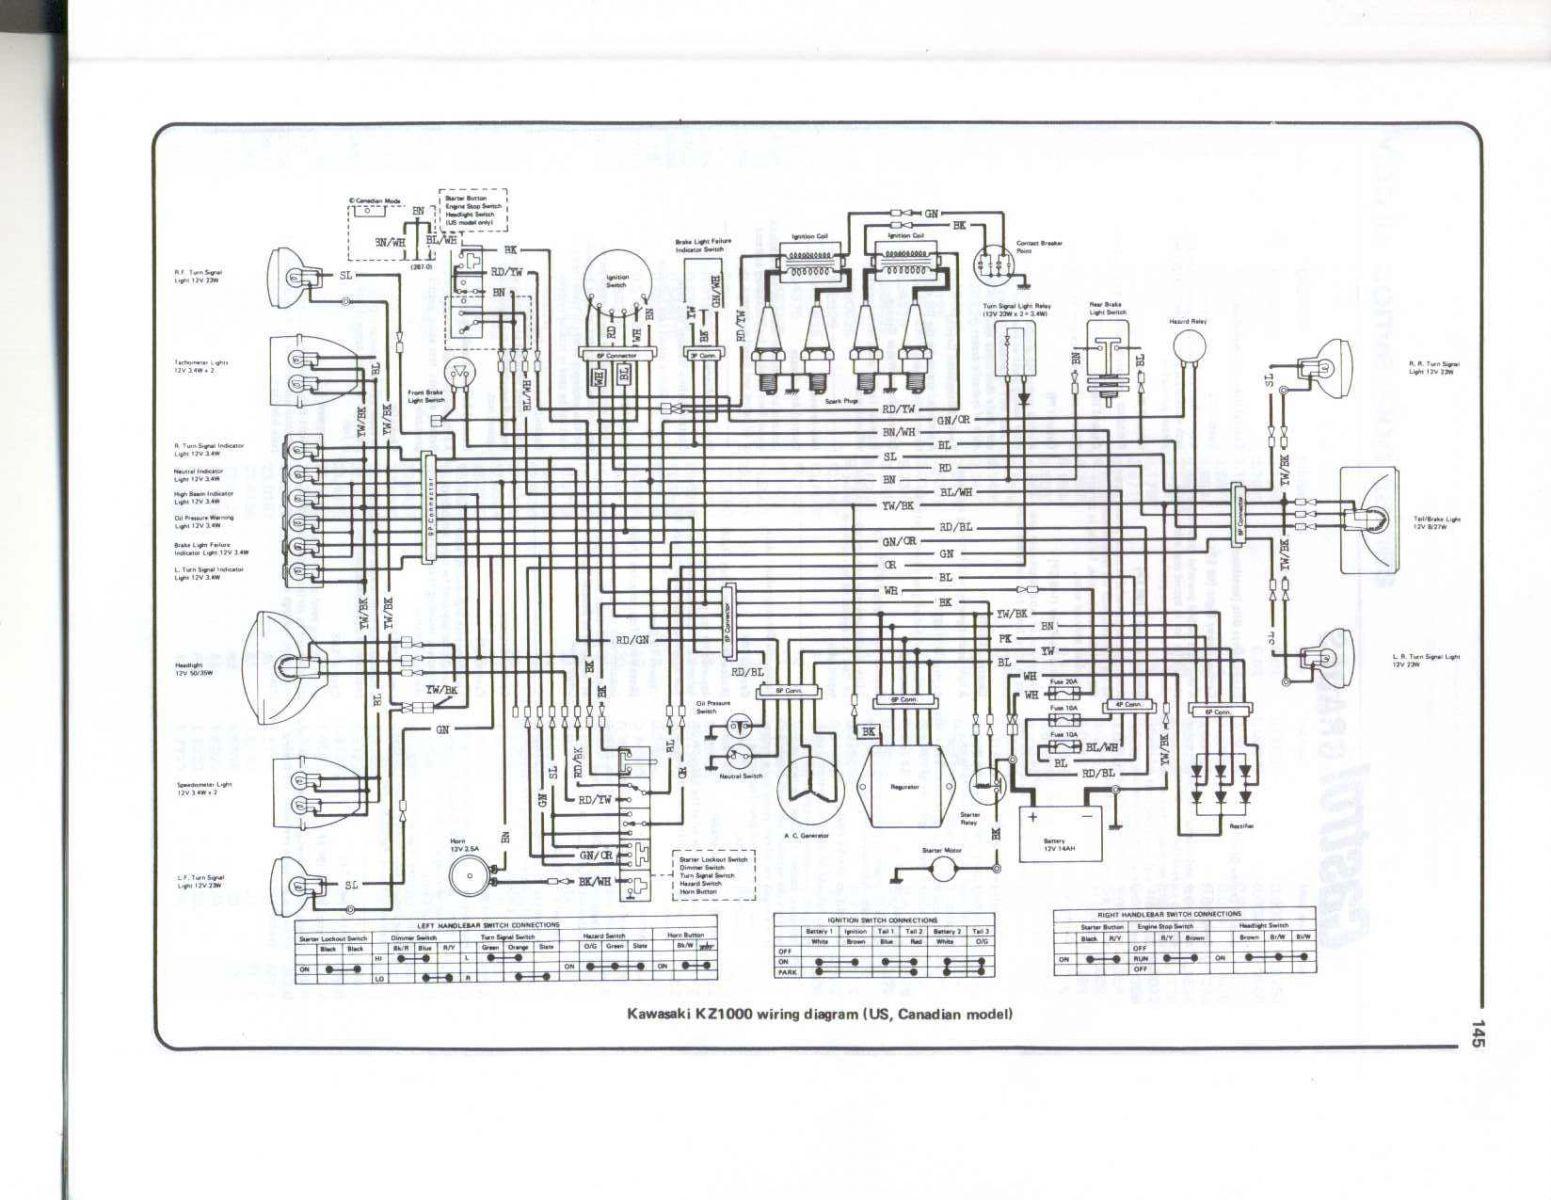 1978 kz1000 wiring diagram defy oven issue kzrider forum kz z1 and z motorcycle